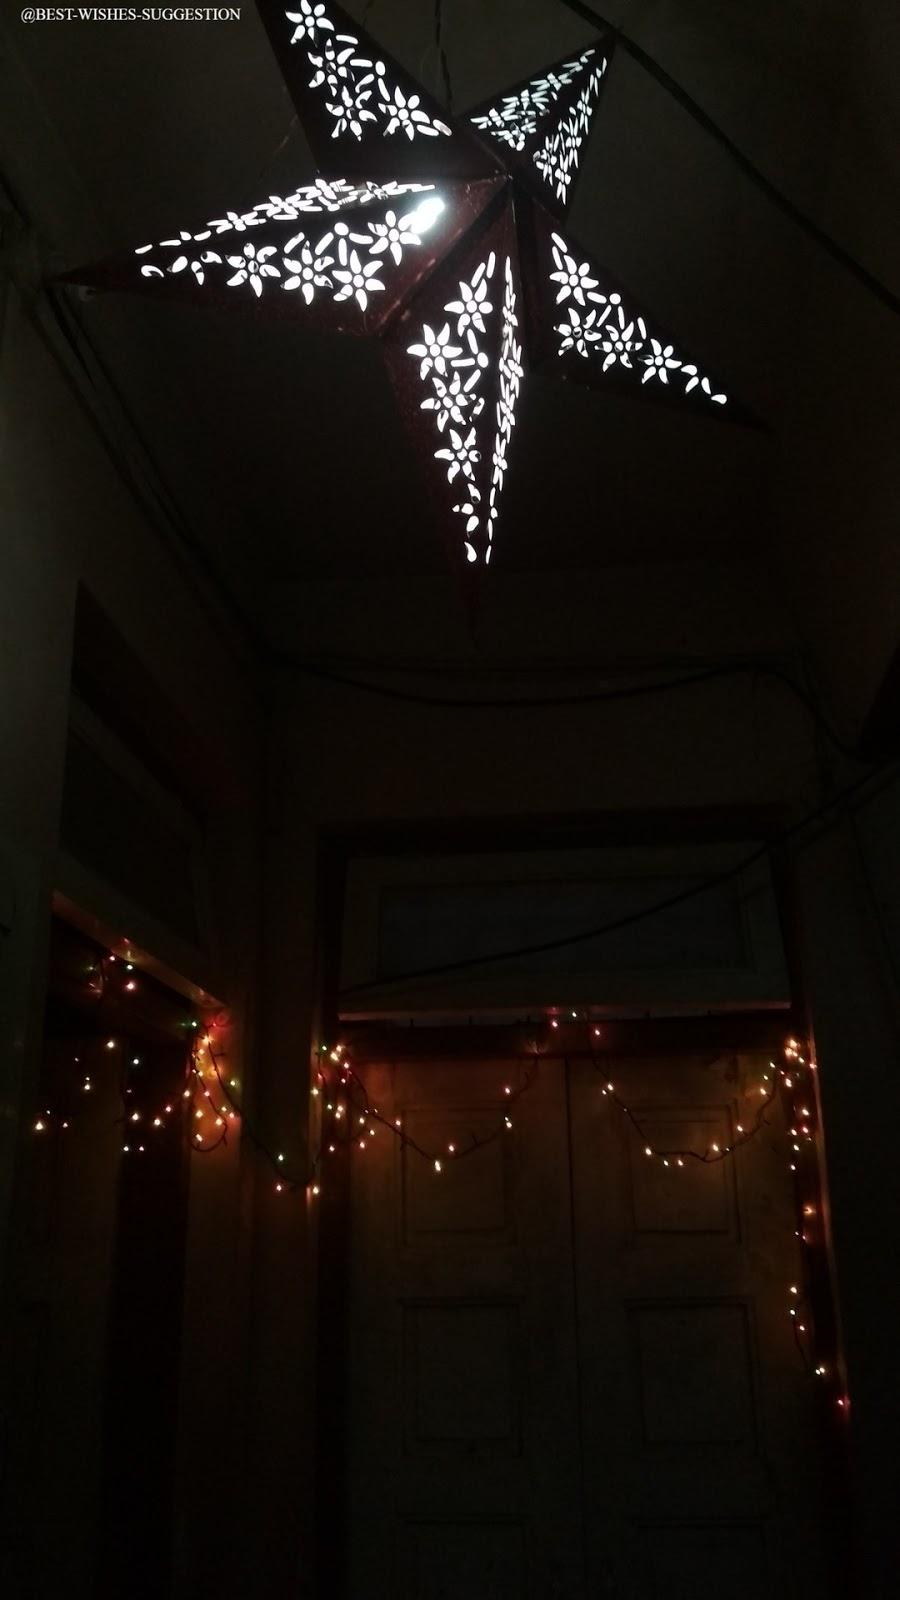 Happy-Diwali-Images-star